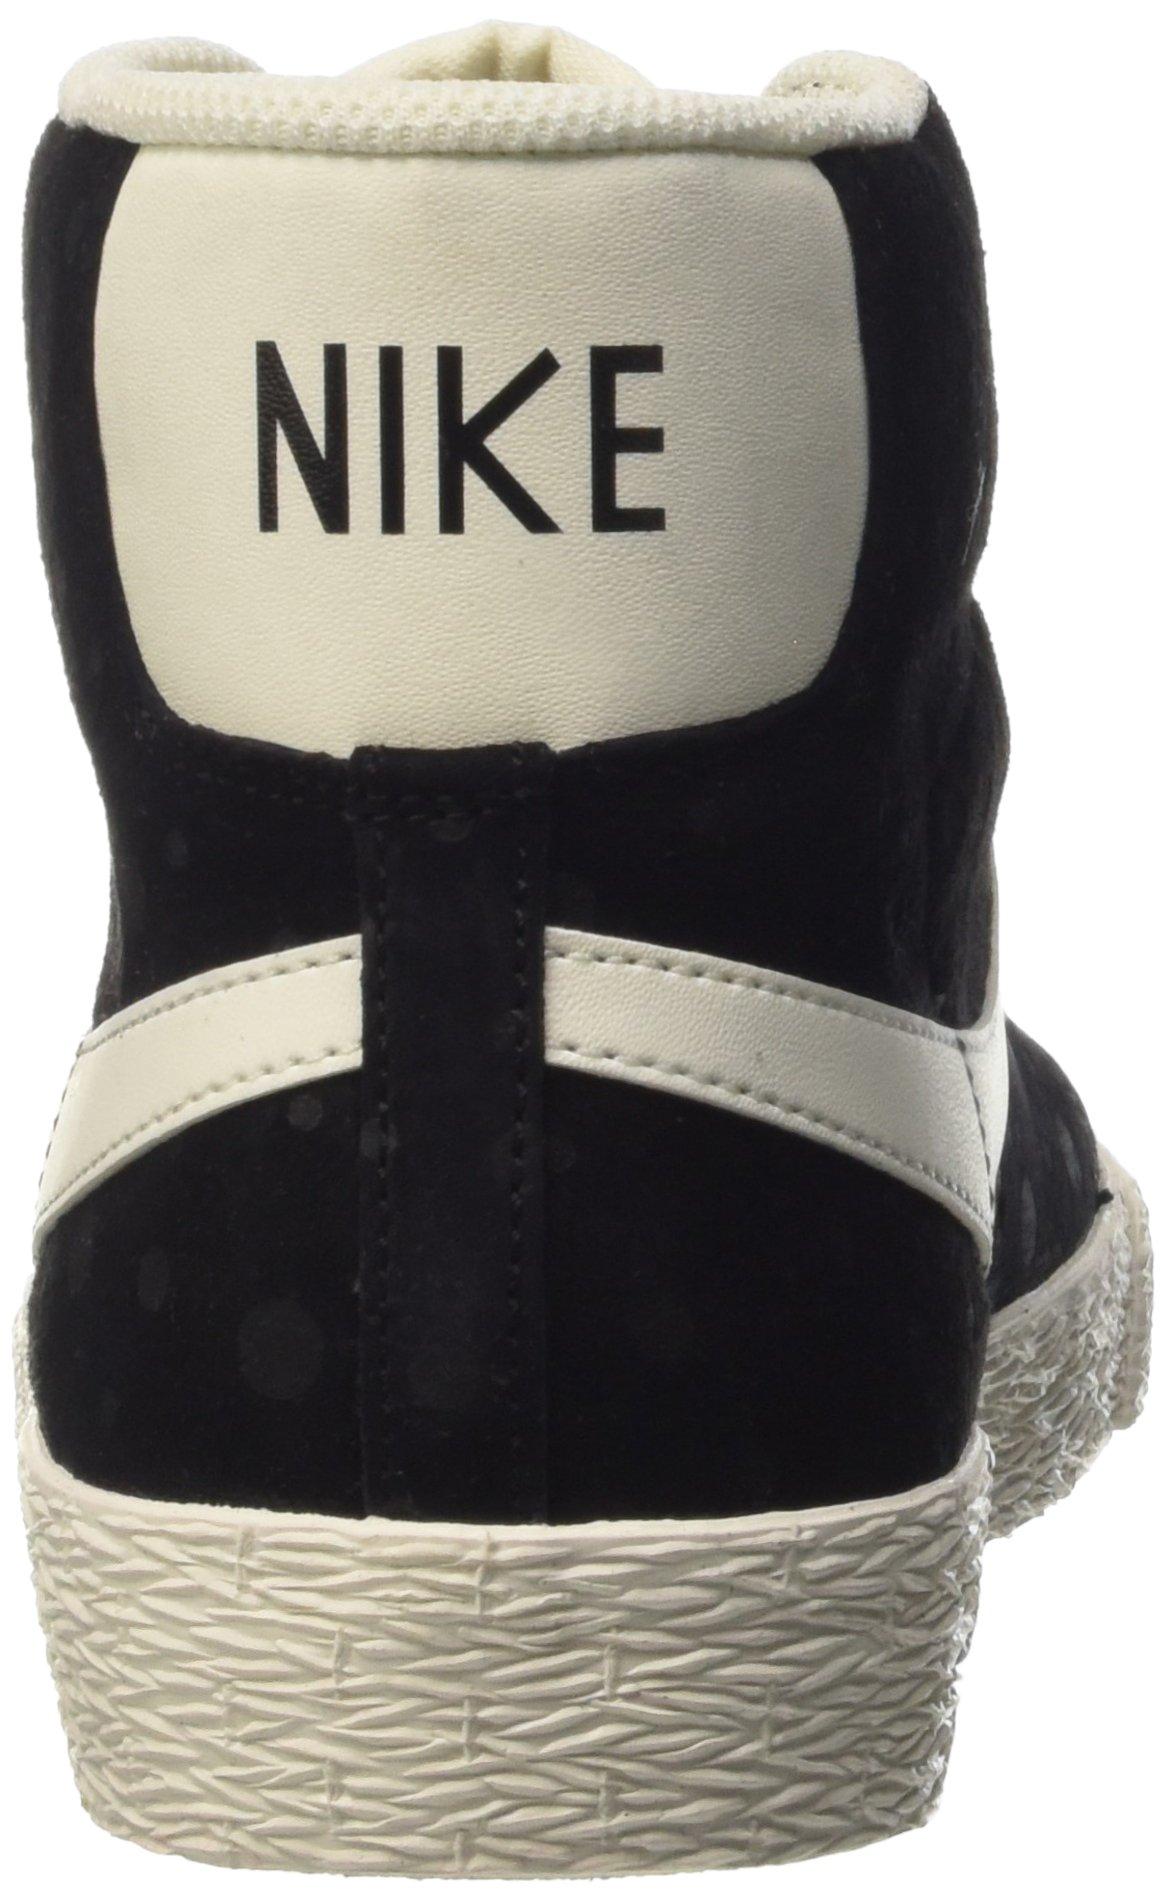 Nike Women's Blazer Mid Suede Vintage Black/White 518171-015 (SIZE: 8) by NIKE (Image #2)